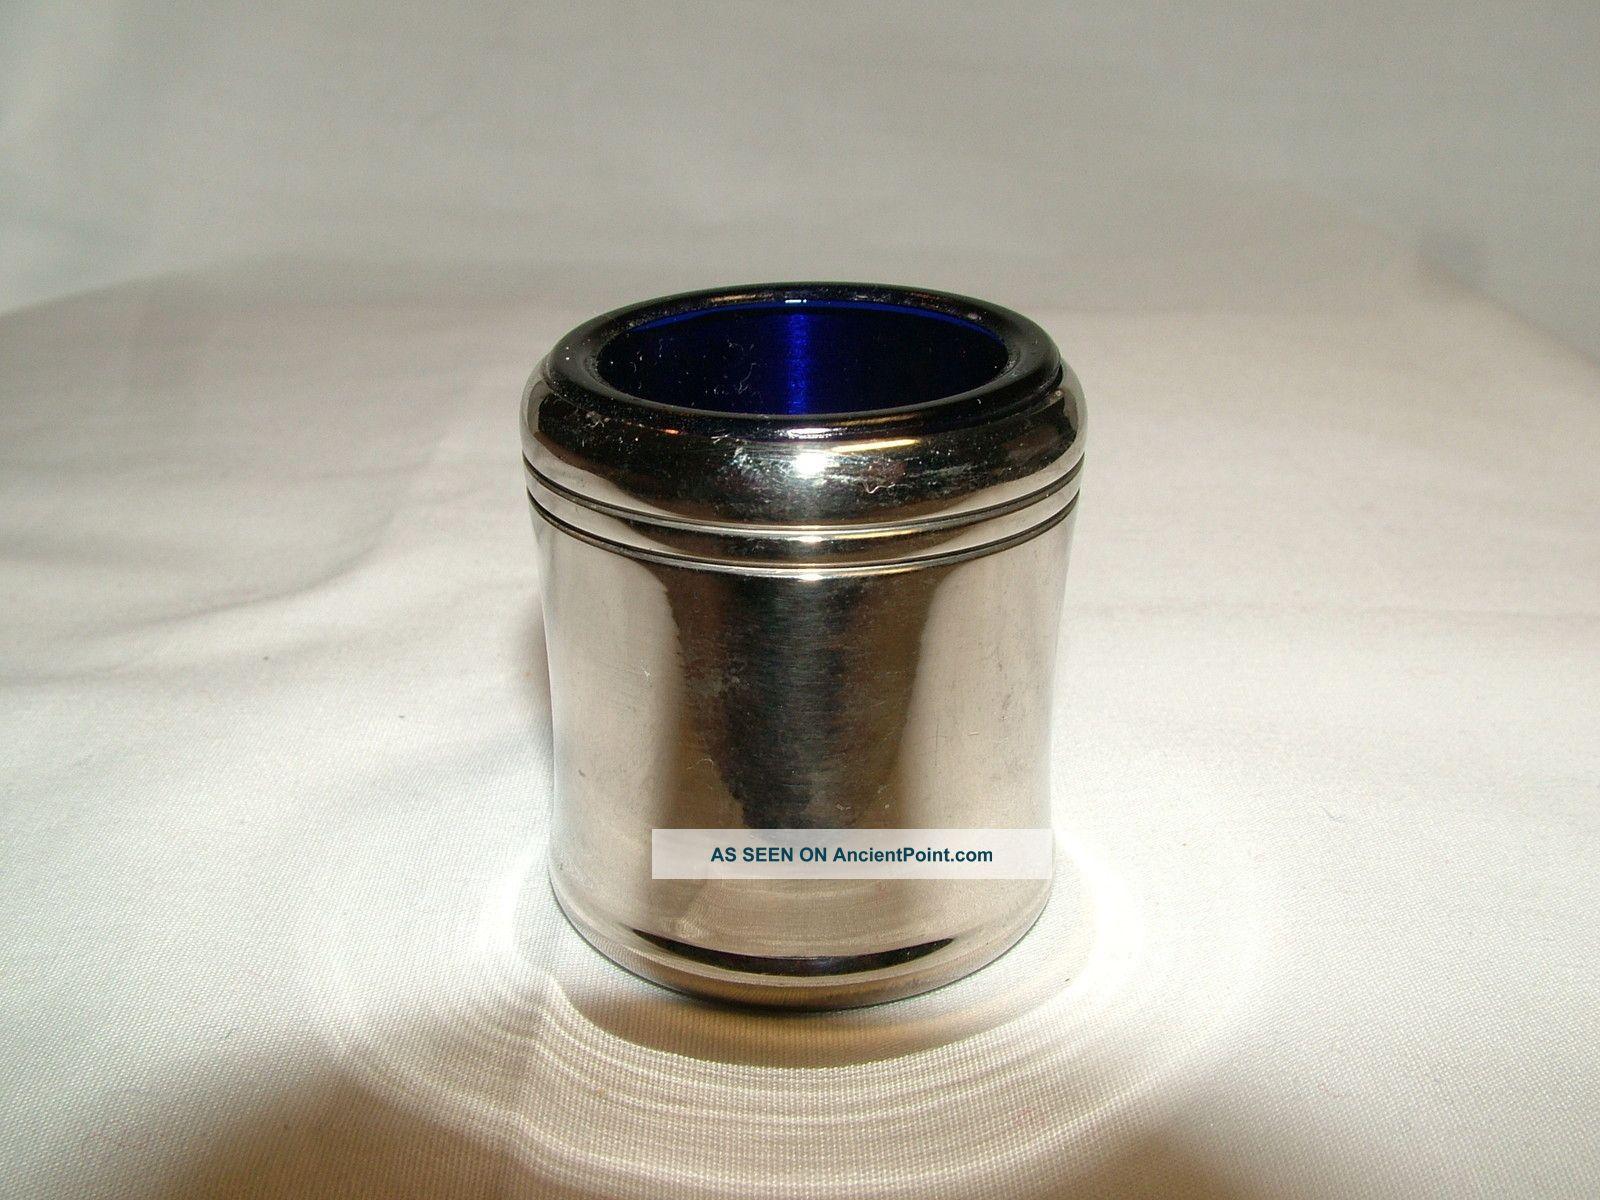 Vintage Plated Mustard Pot & Blue Glass Insert - Cmp Co Mustard Pots photo